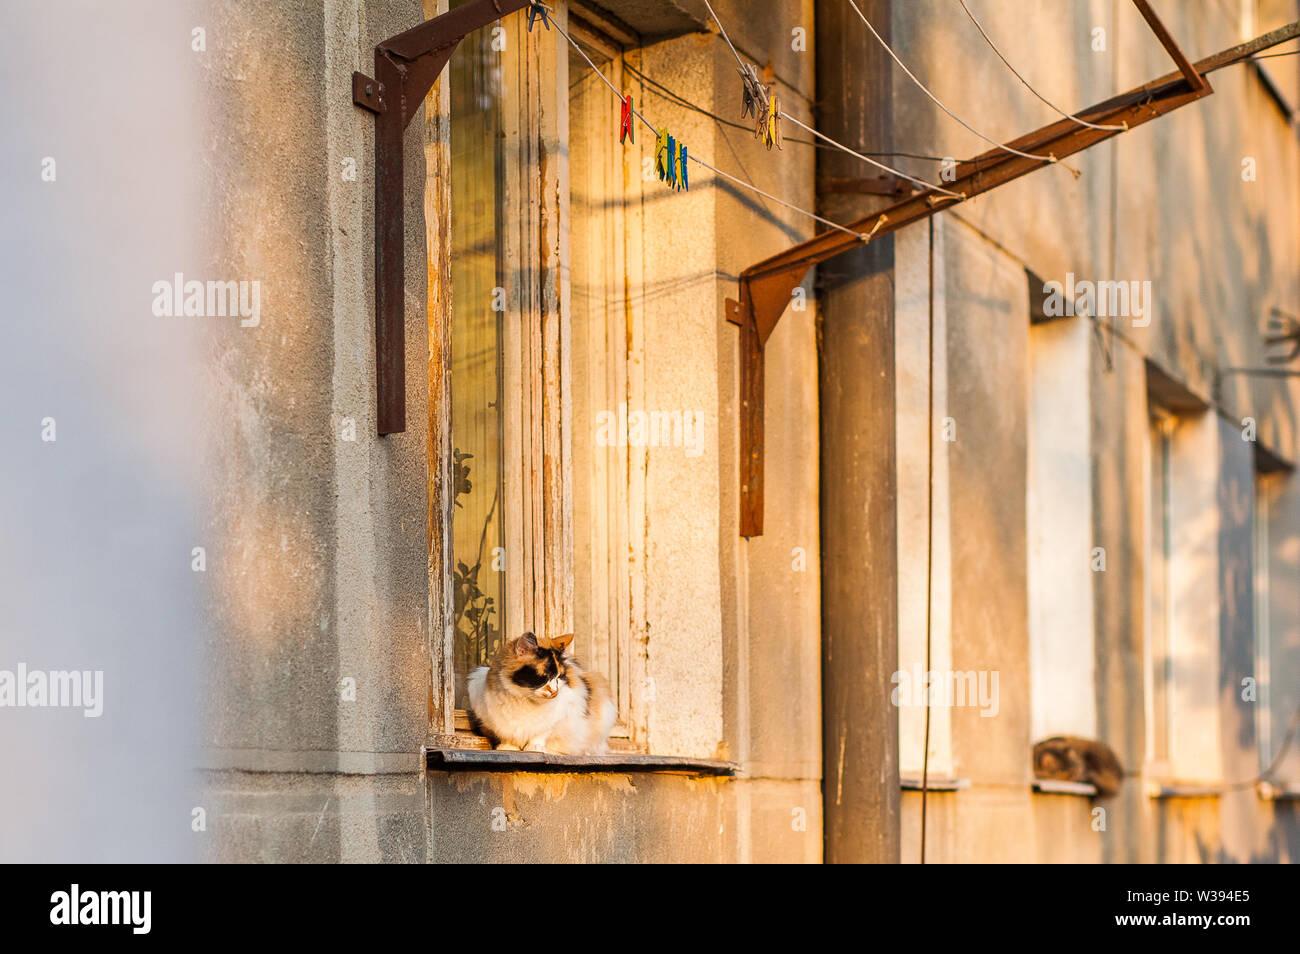 Striped cat strolling along the street window sill. - Stock Image